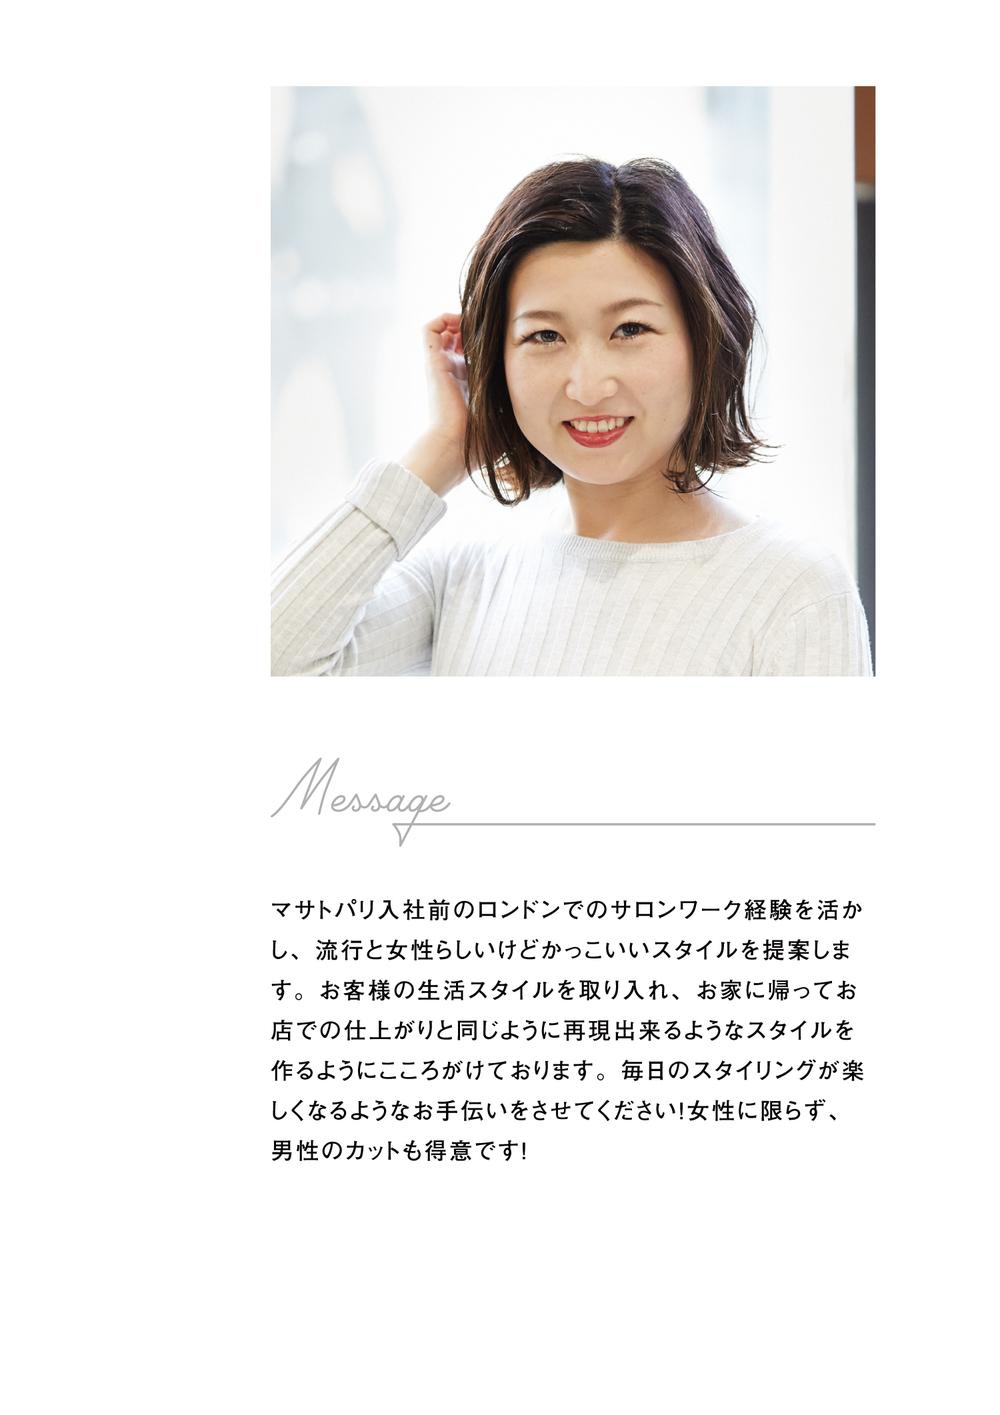 natsumi r6.jpg